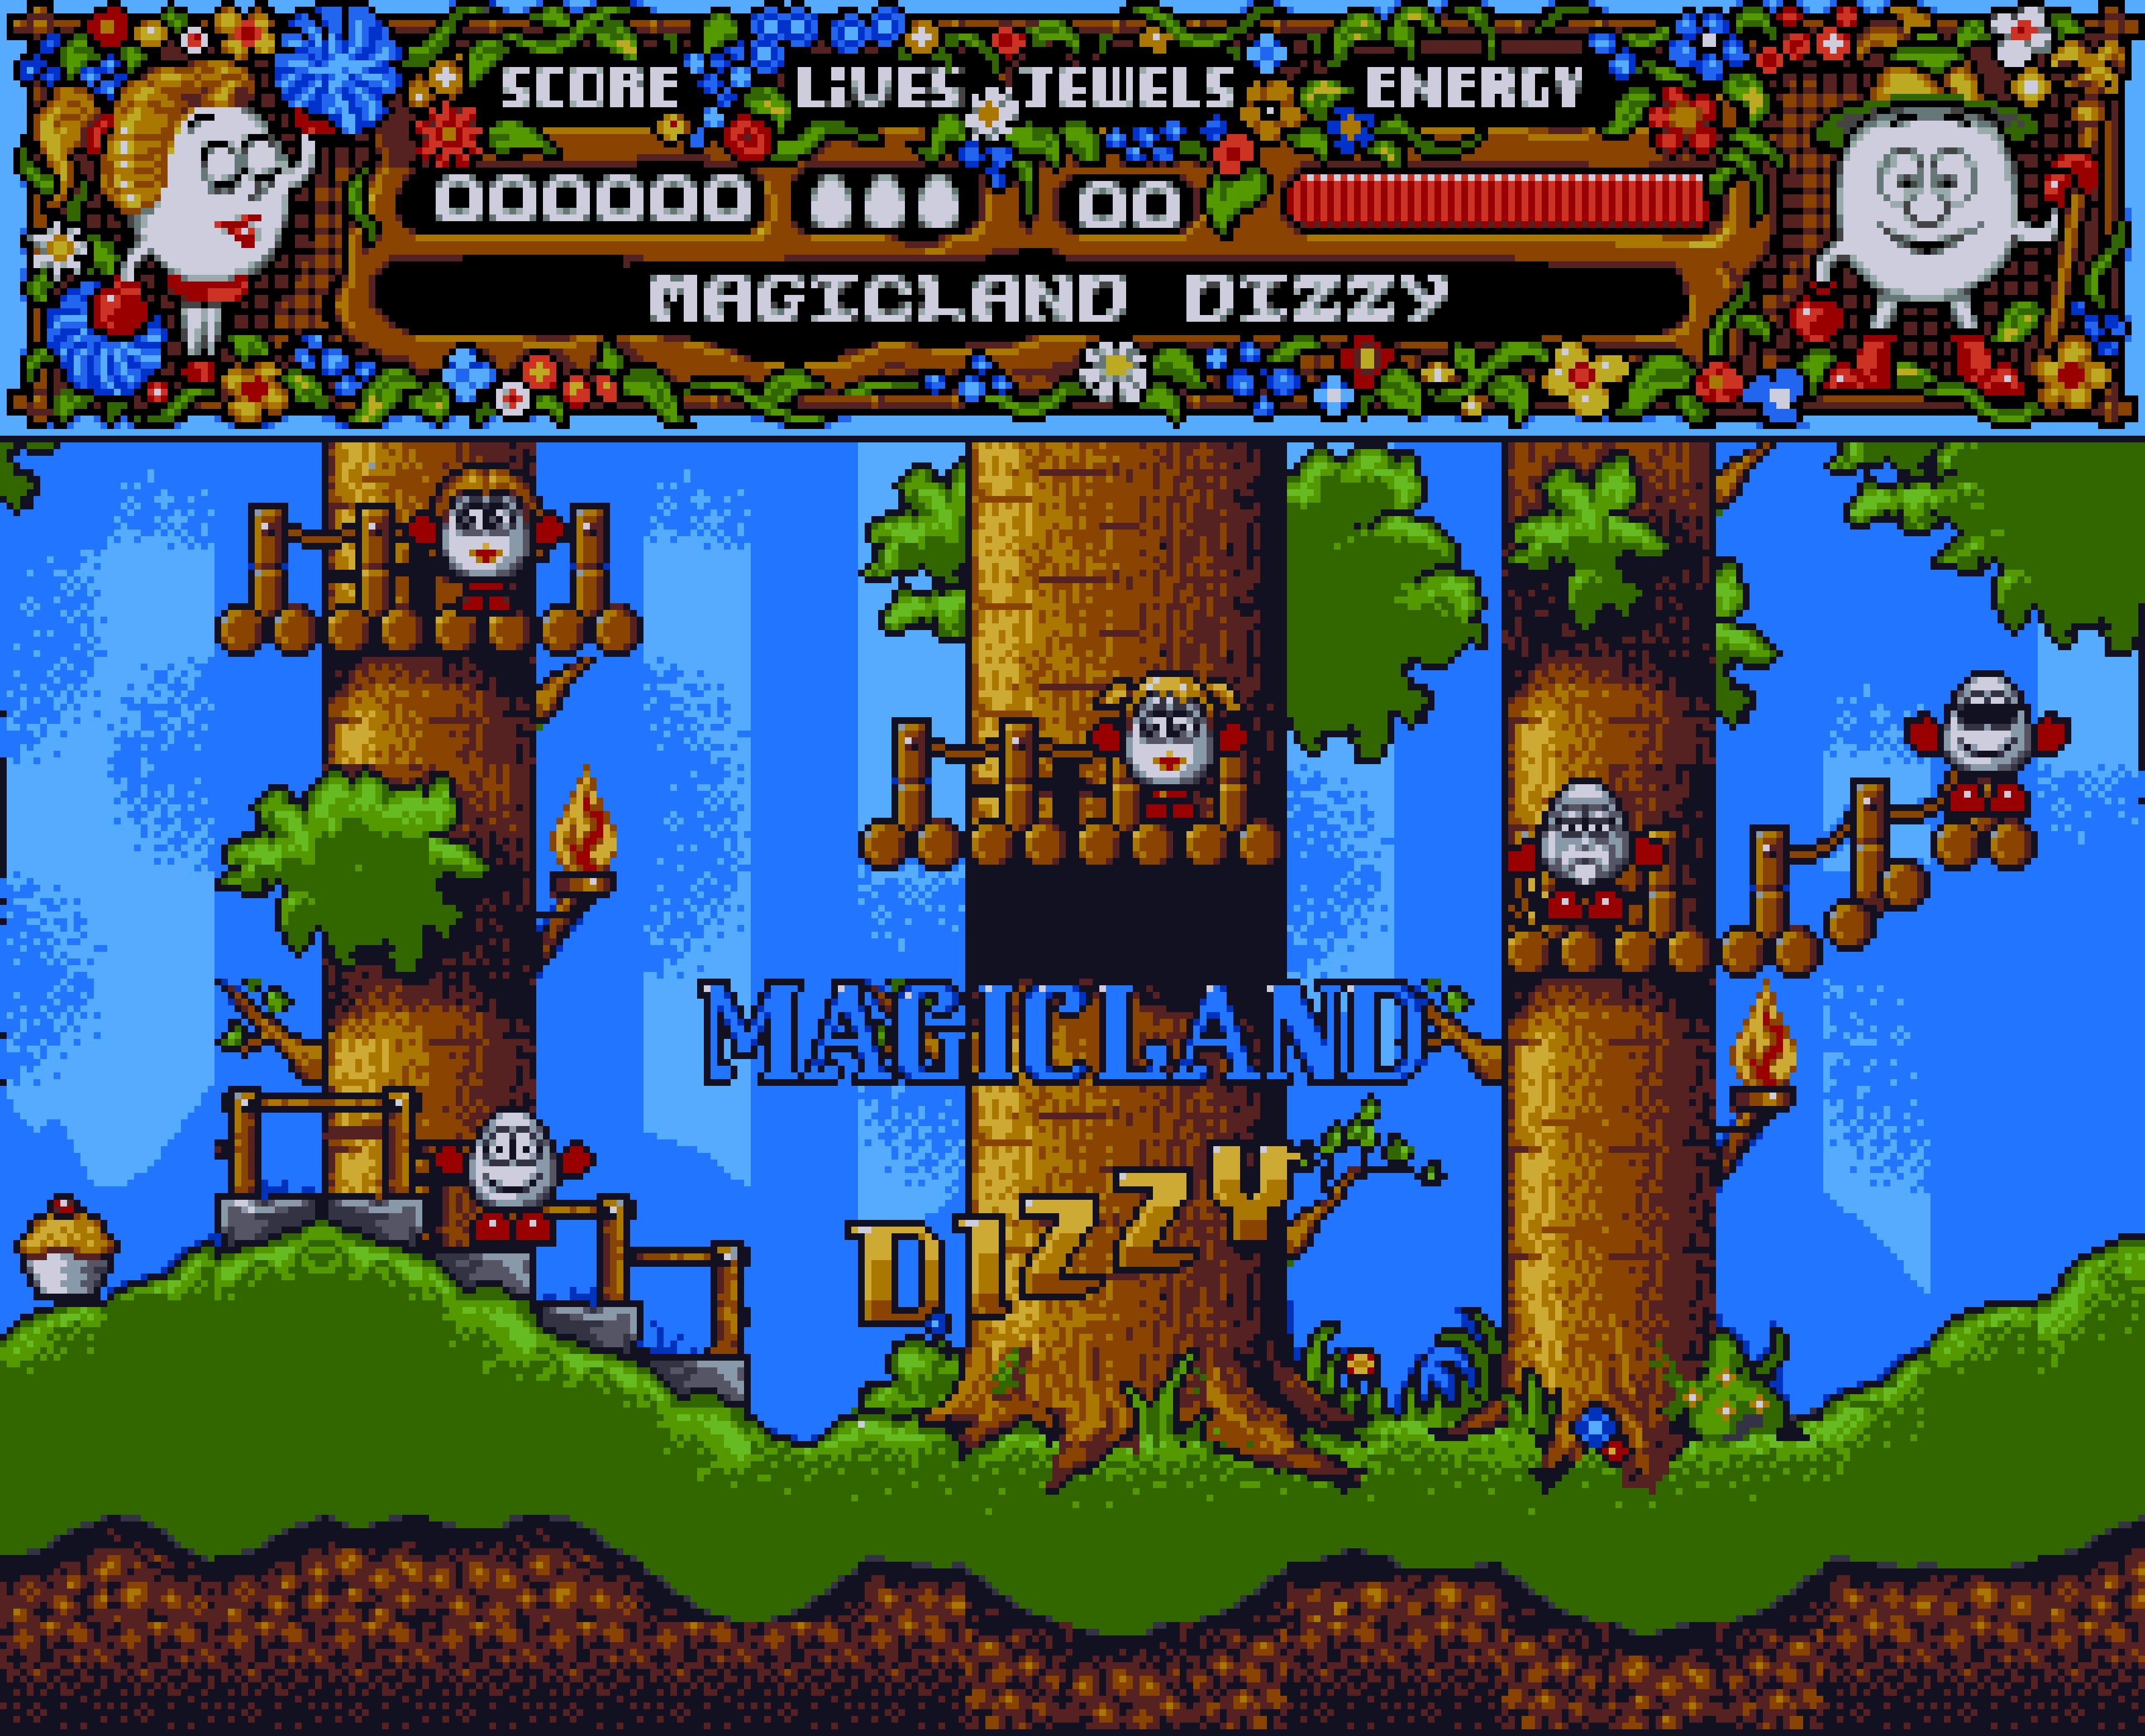 Magicland Dizzy title screen on the Amiga